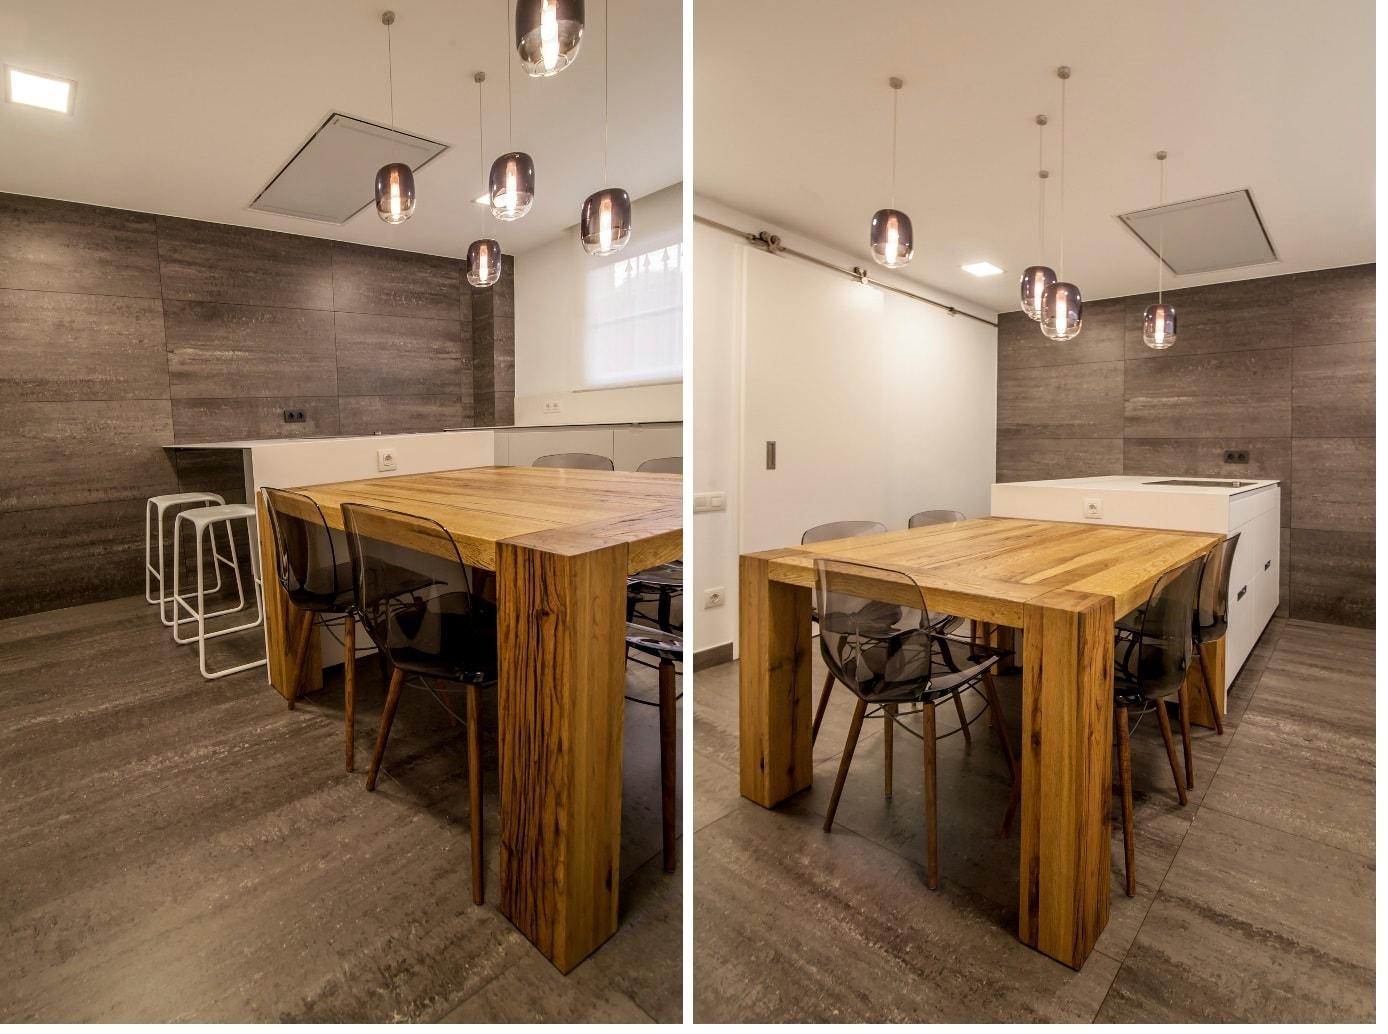 mesas de madera un complemento ideal para las cocinas